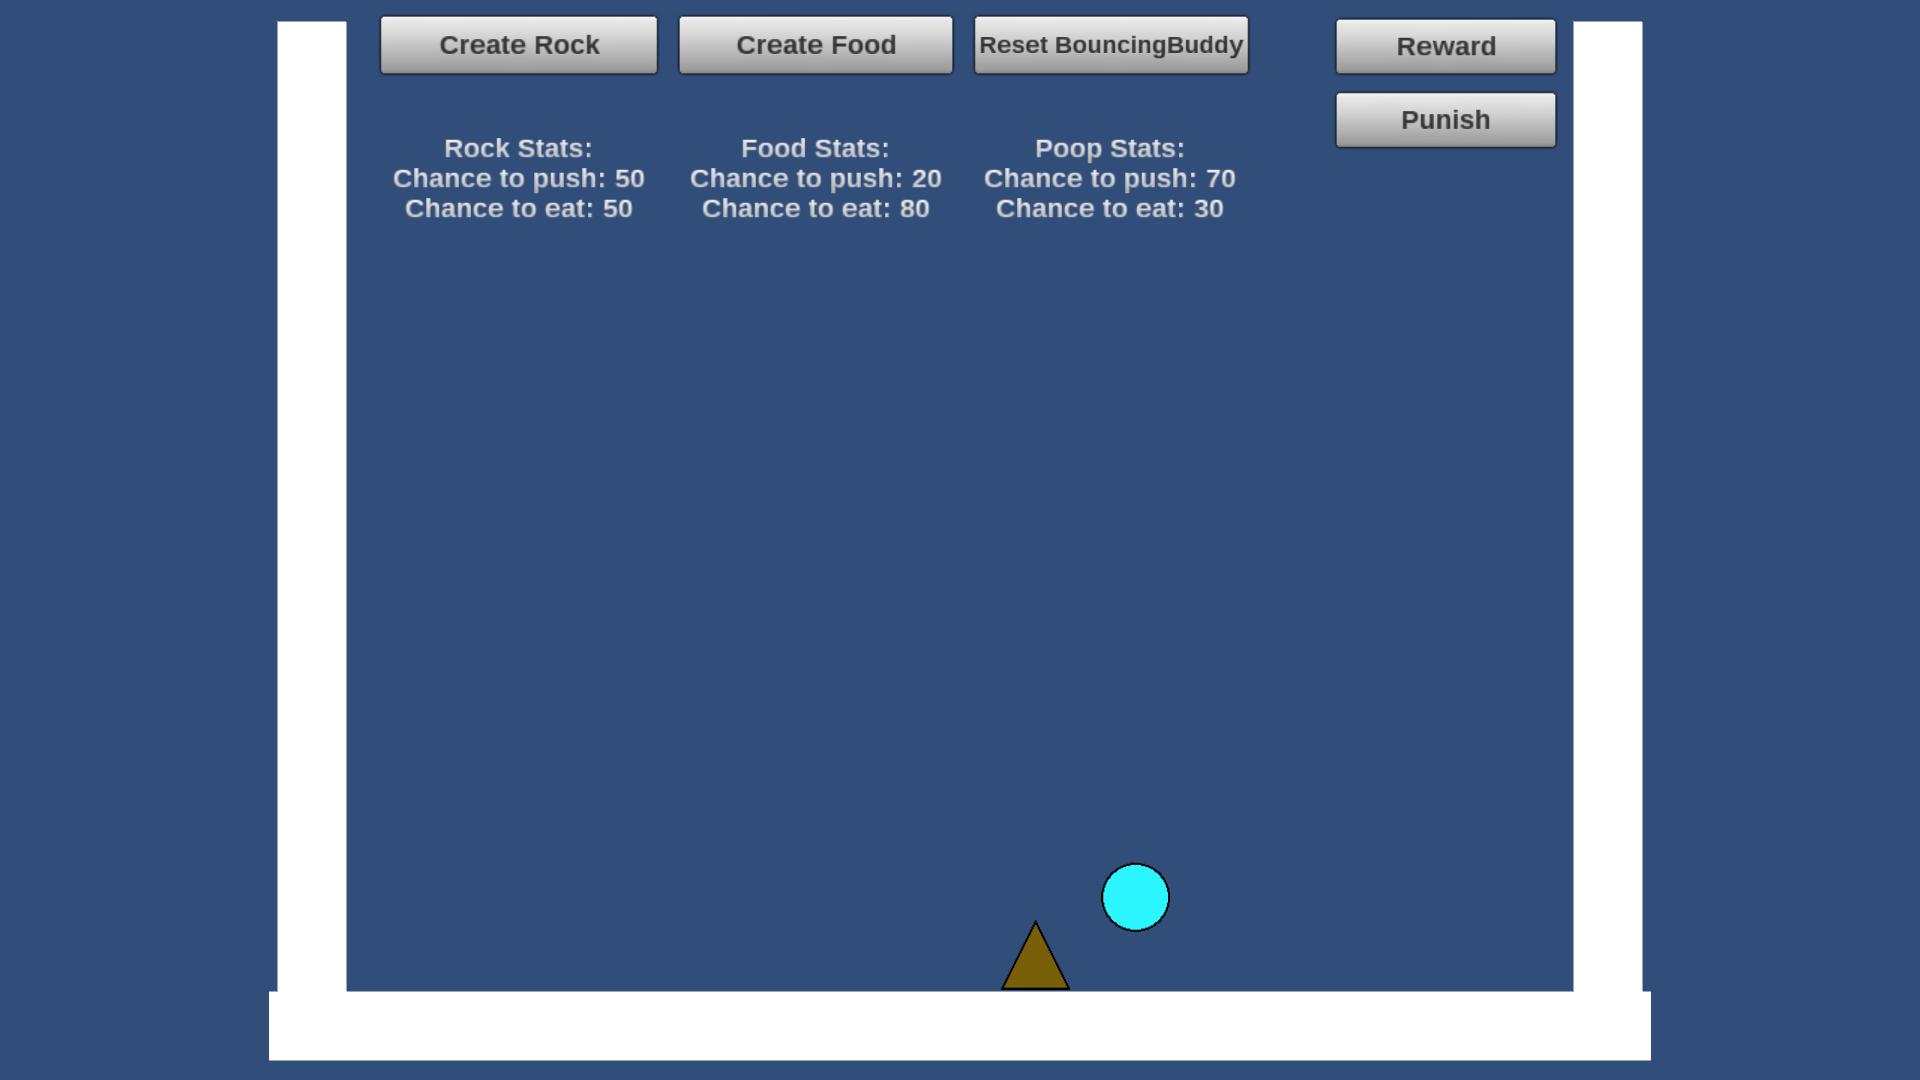 bb_screenshot3.png